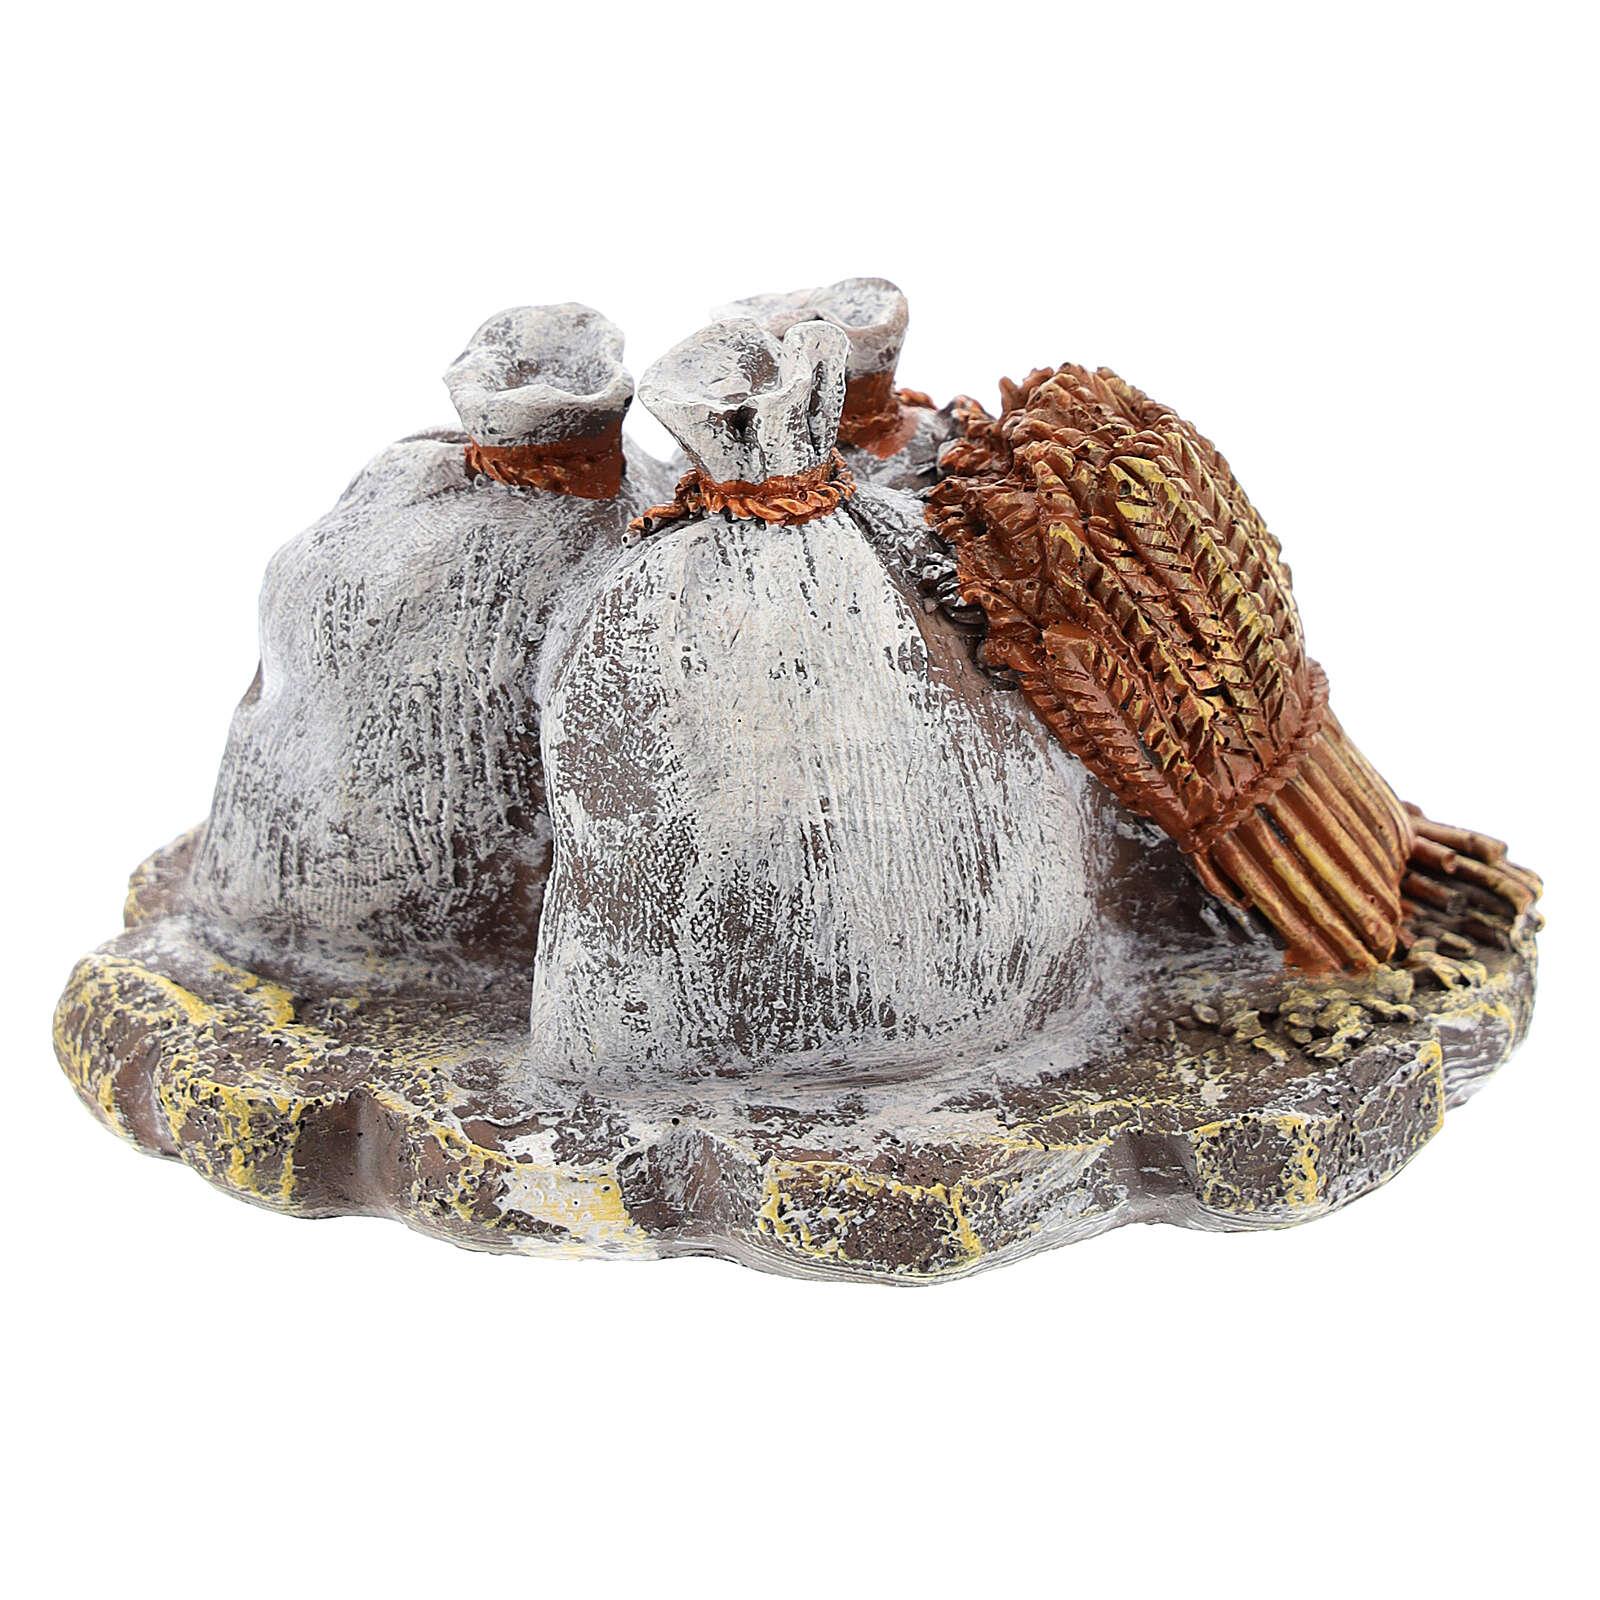 Miniature sacks and lantern in resin, DIY nativity 8-10 cm 4